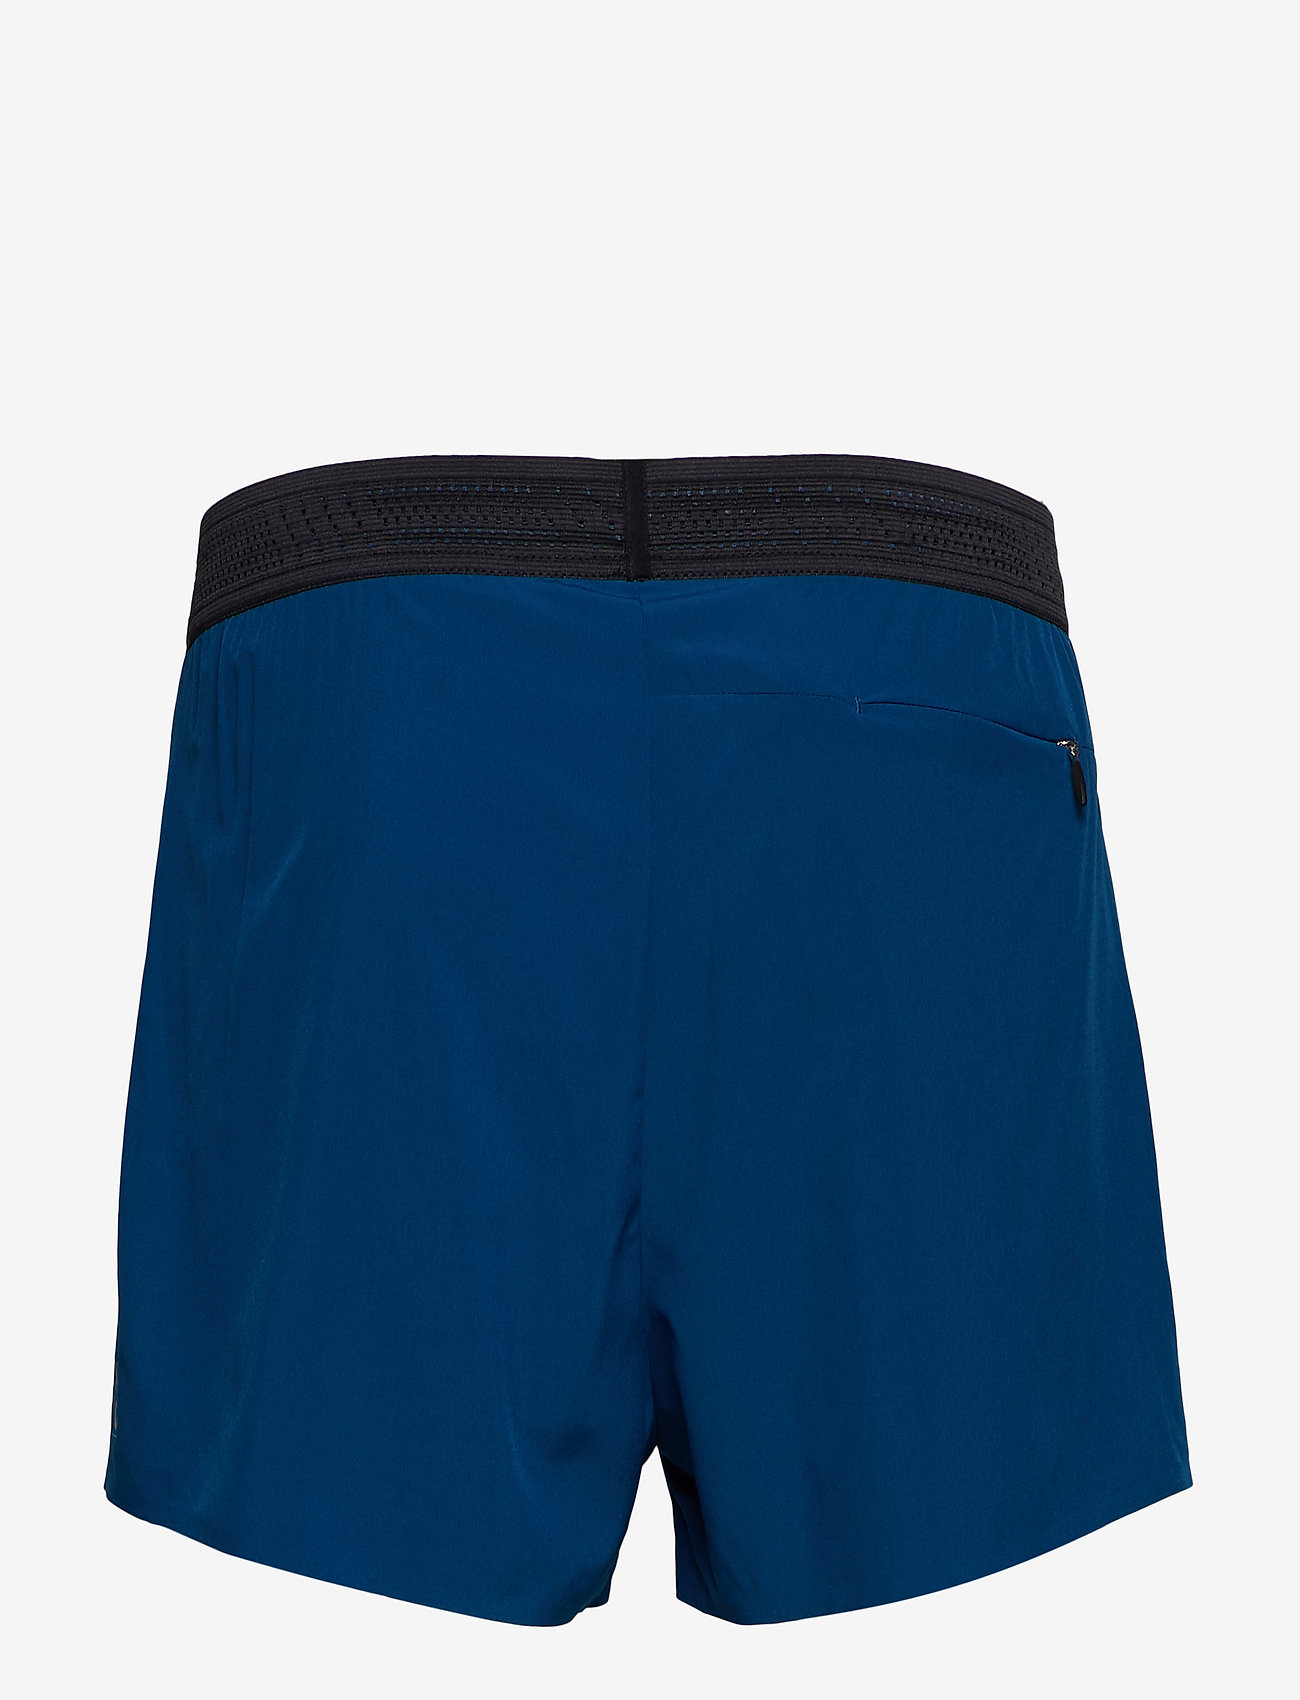 Nanoweight Shorts M (Nox) - Craft FqBXj3